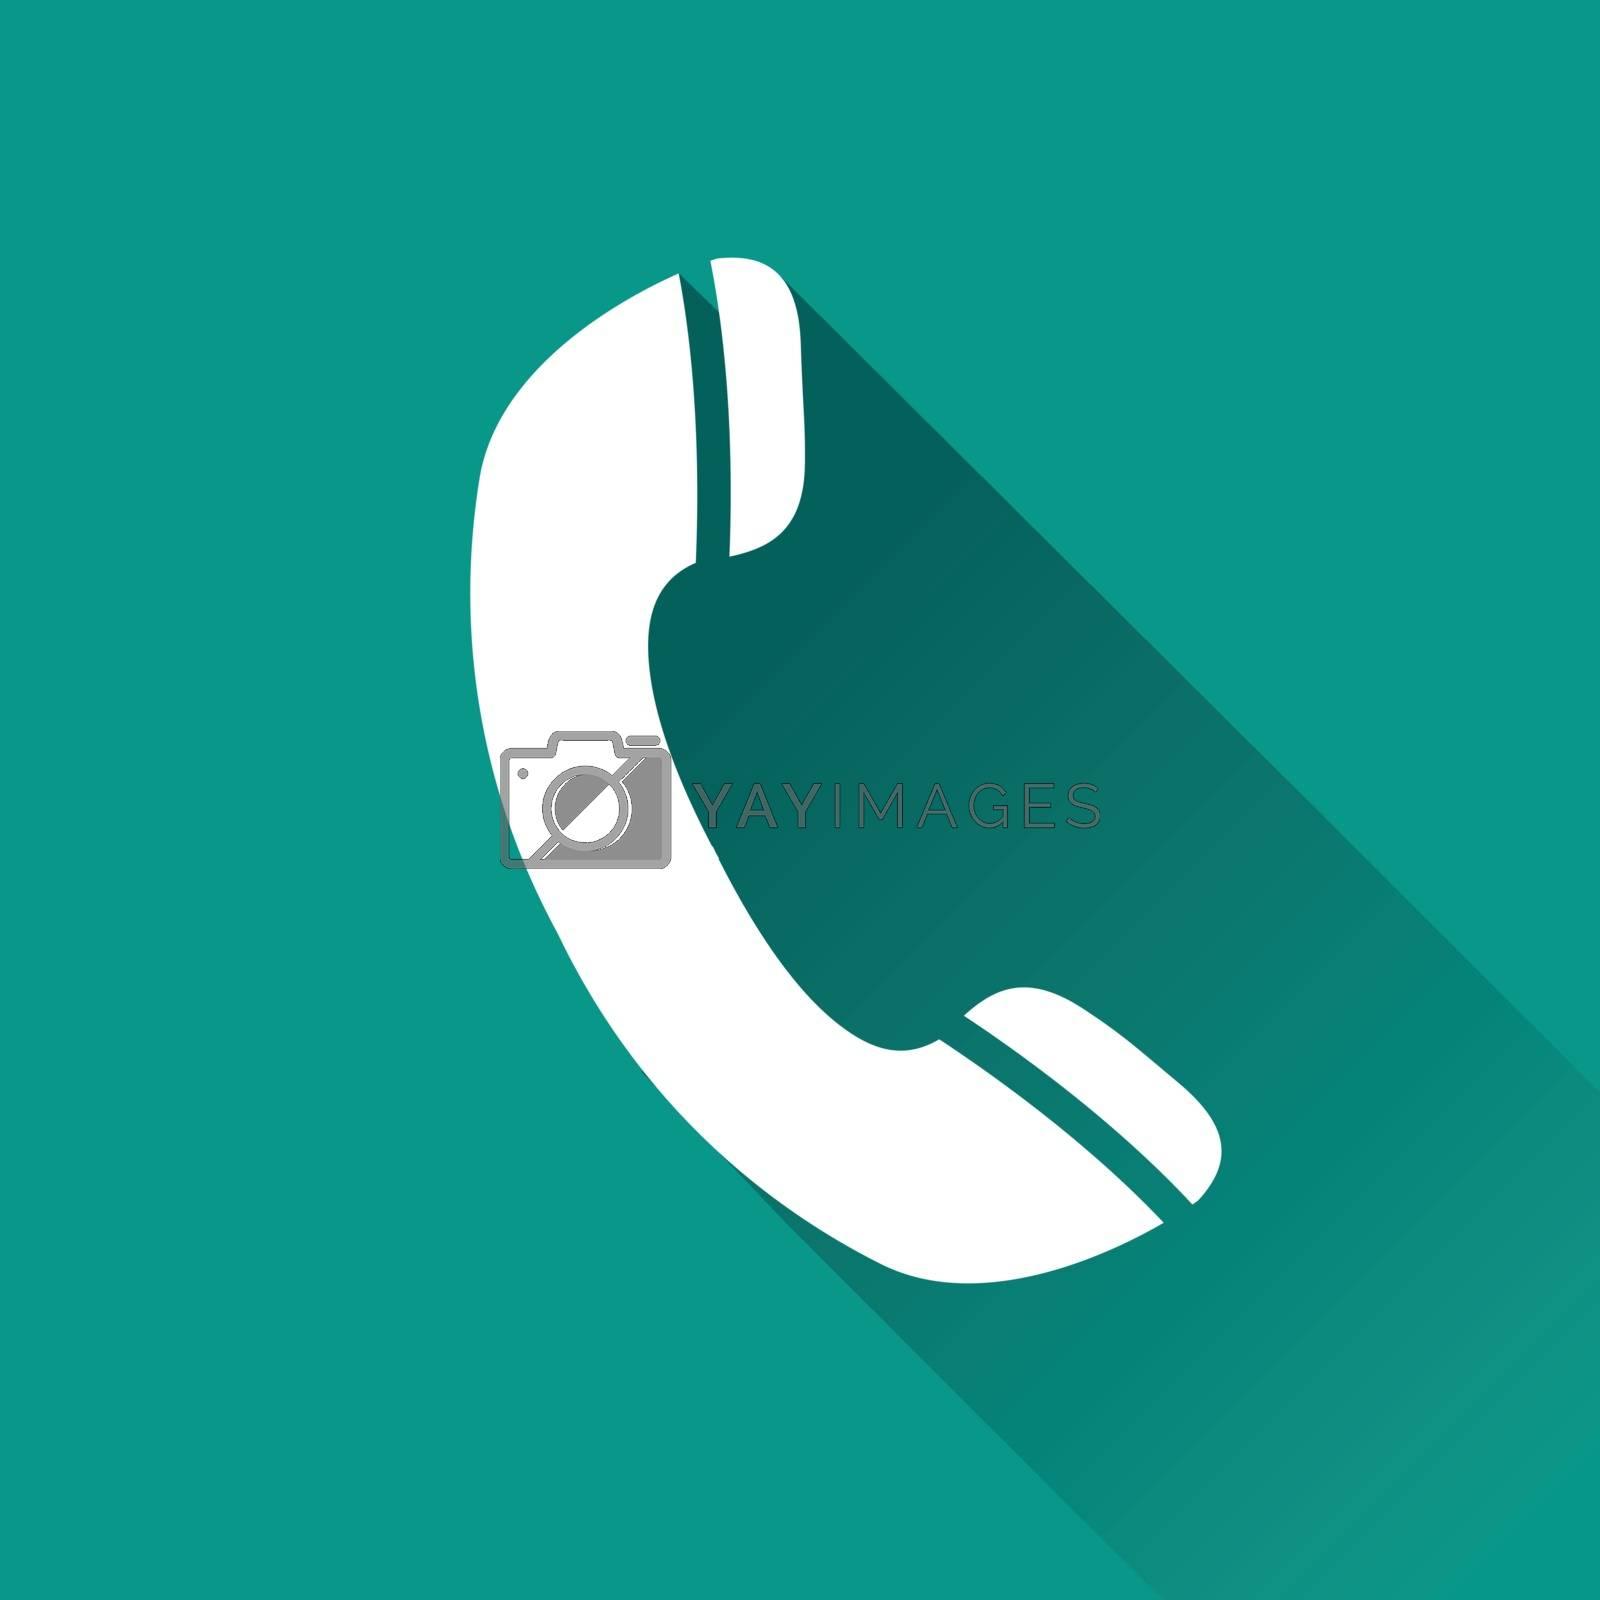 Royalty free image of phone flat design icon by nickylarson974